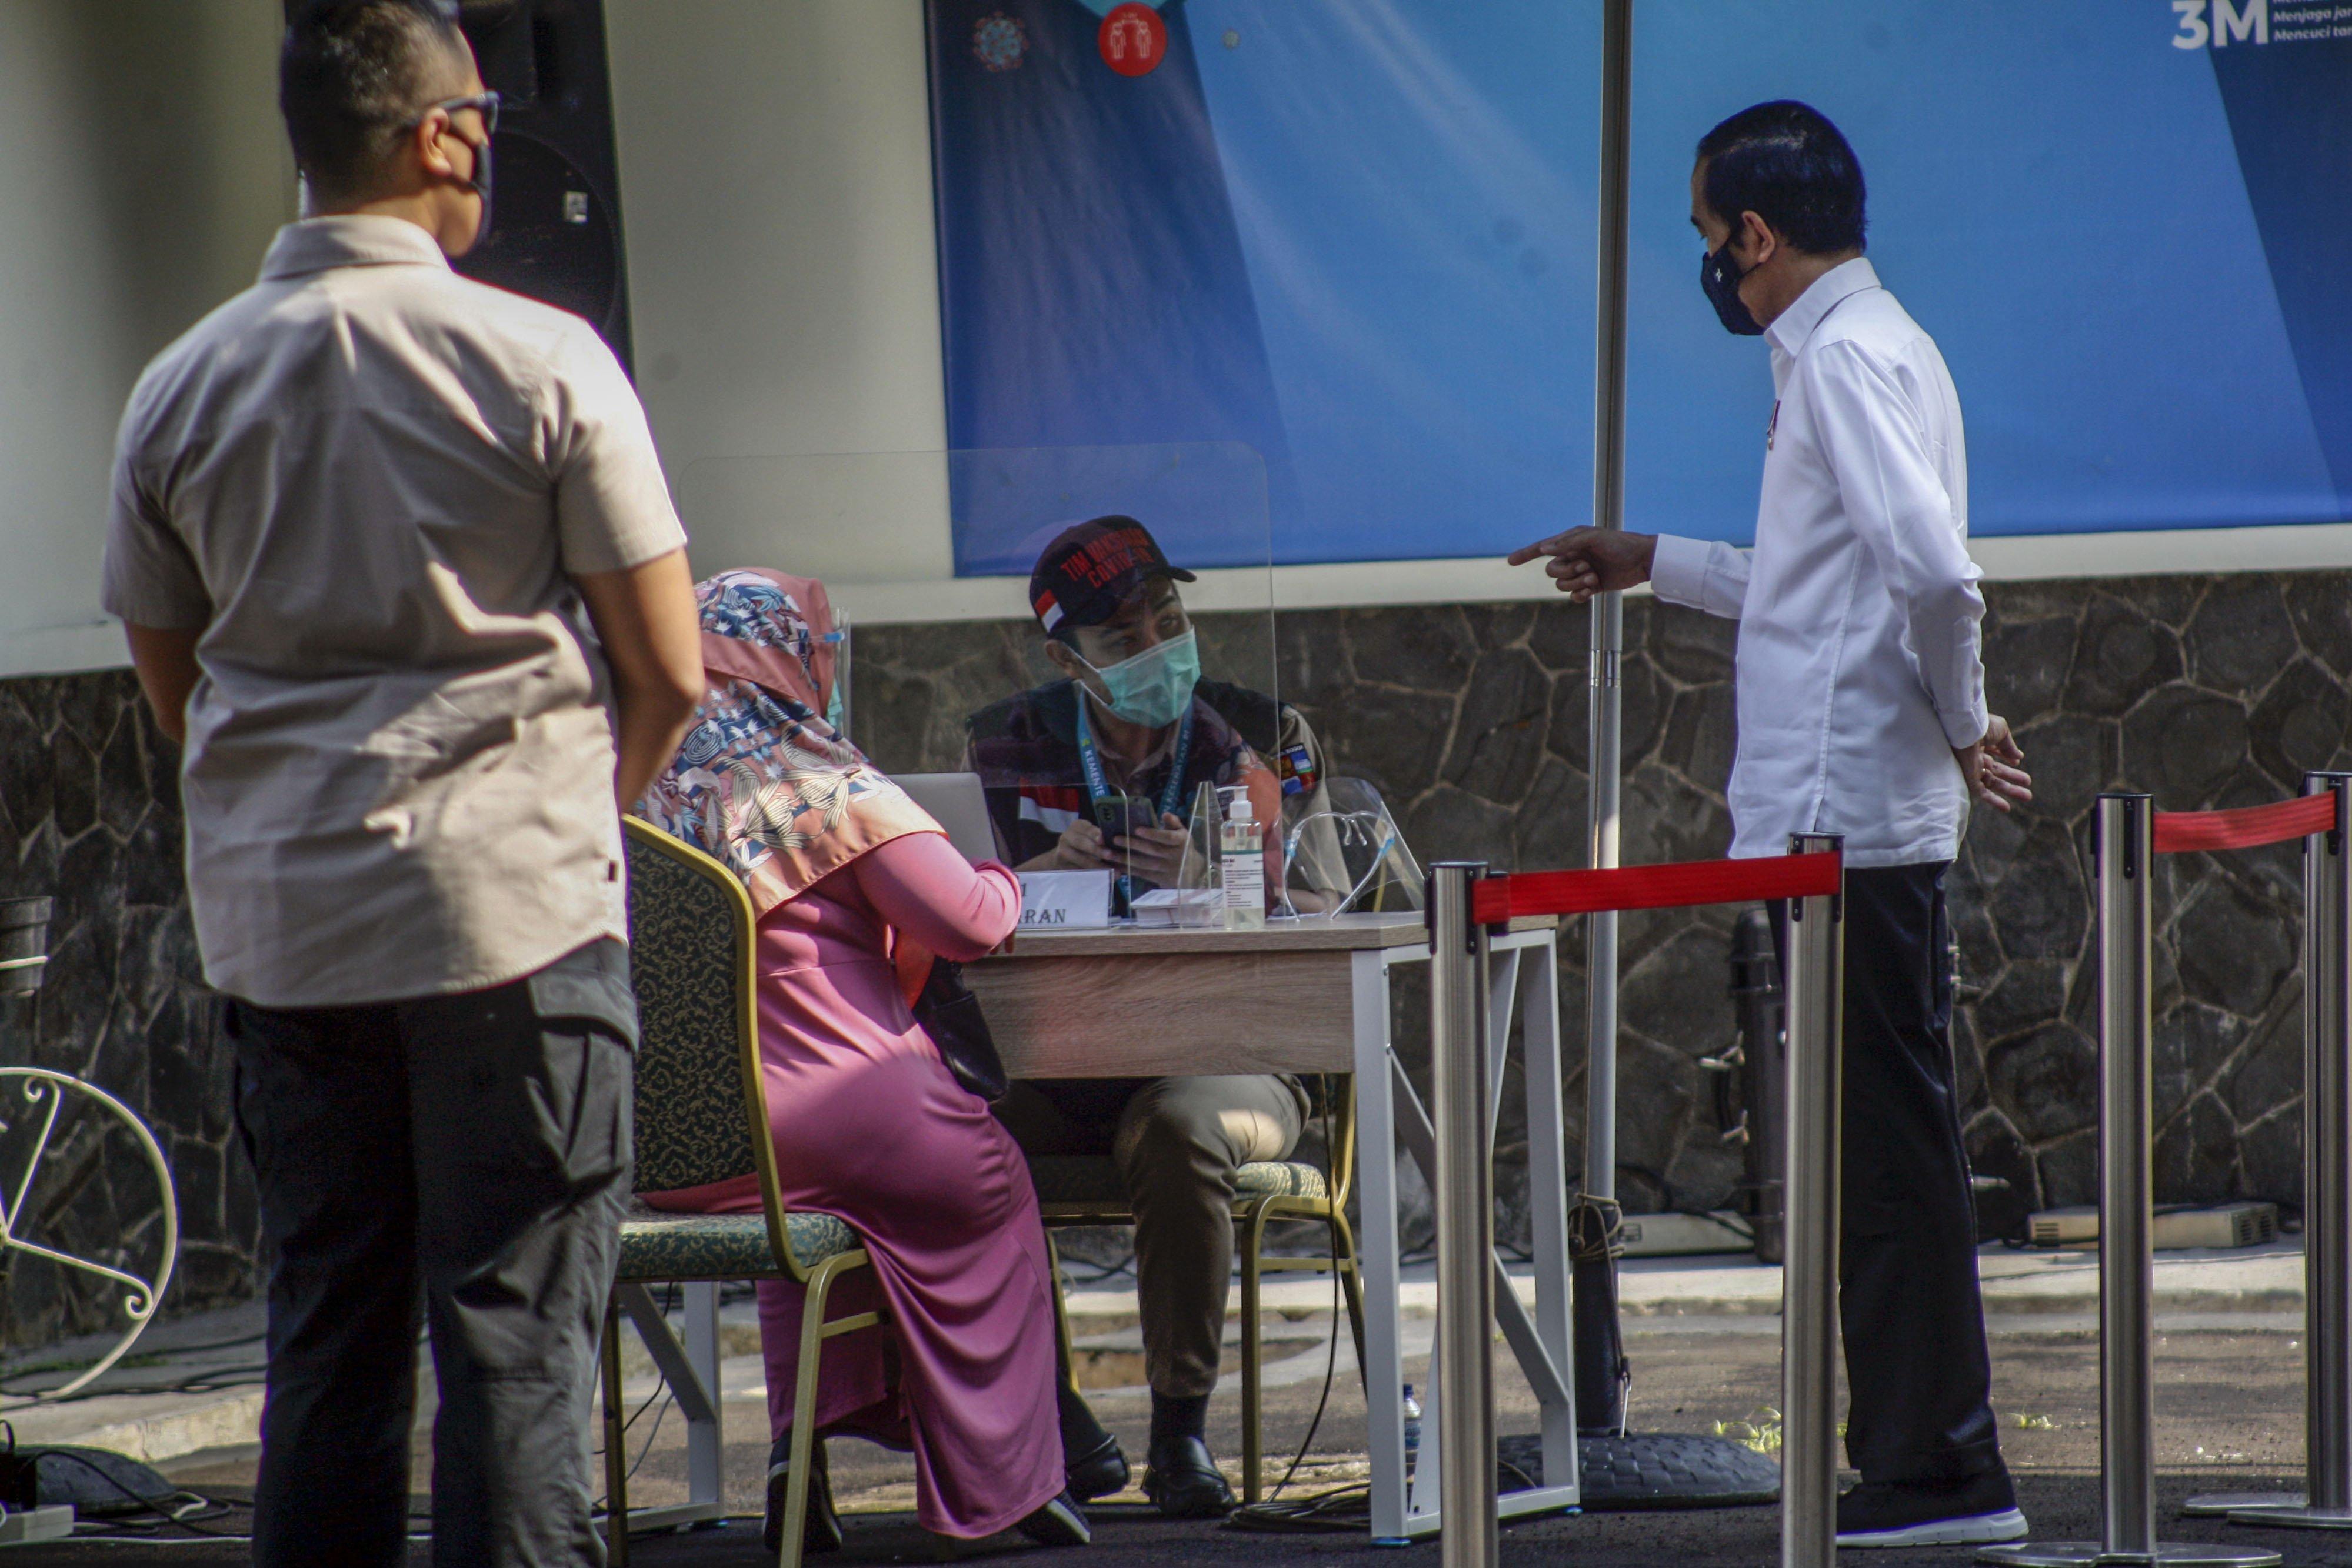 Presiden Joko Widodo (Jokowi) meninjau simulasi pemberian vaksinasi COVID-19 di Puskesmas Tanah Sareal, Kota Bogor, Jawa Barat, Rabu (18/11/2020). Dalam kunjungannya, Jokowi meninjau satu persatu tahapan simulasi pemberian vaksin COVID-19, dan juga meminta pada saat pemberian vaksinasi nanti lebih sempurna sehingga aman, cepat dan memperhatikan protokol kesehatan.